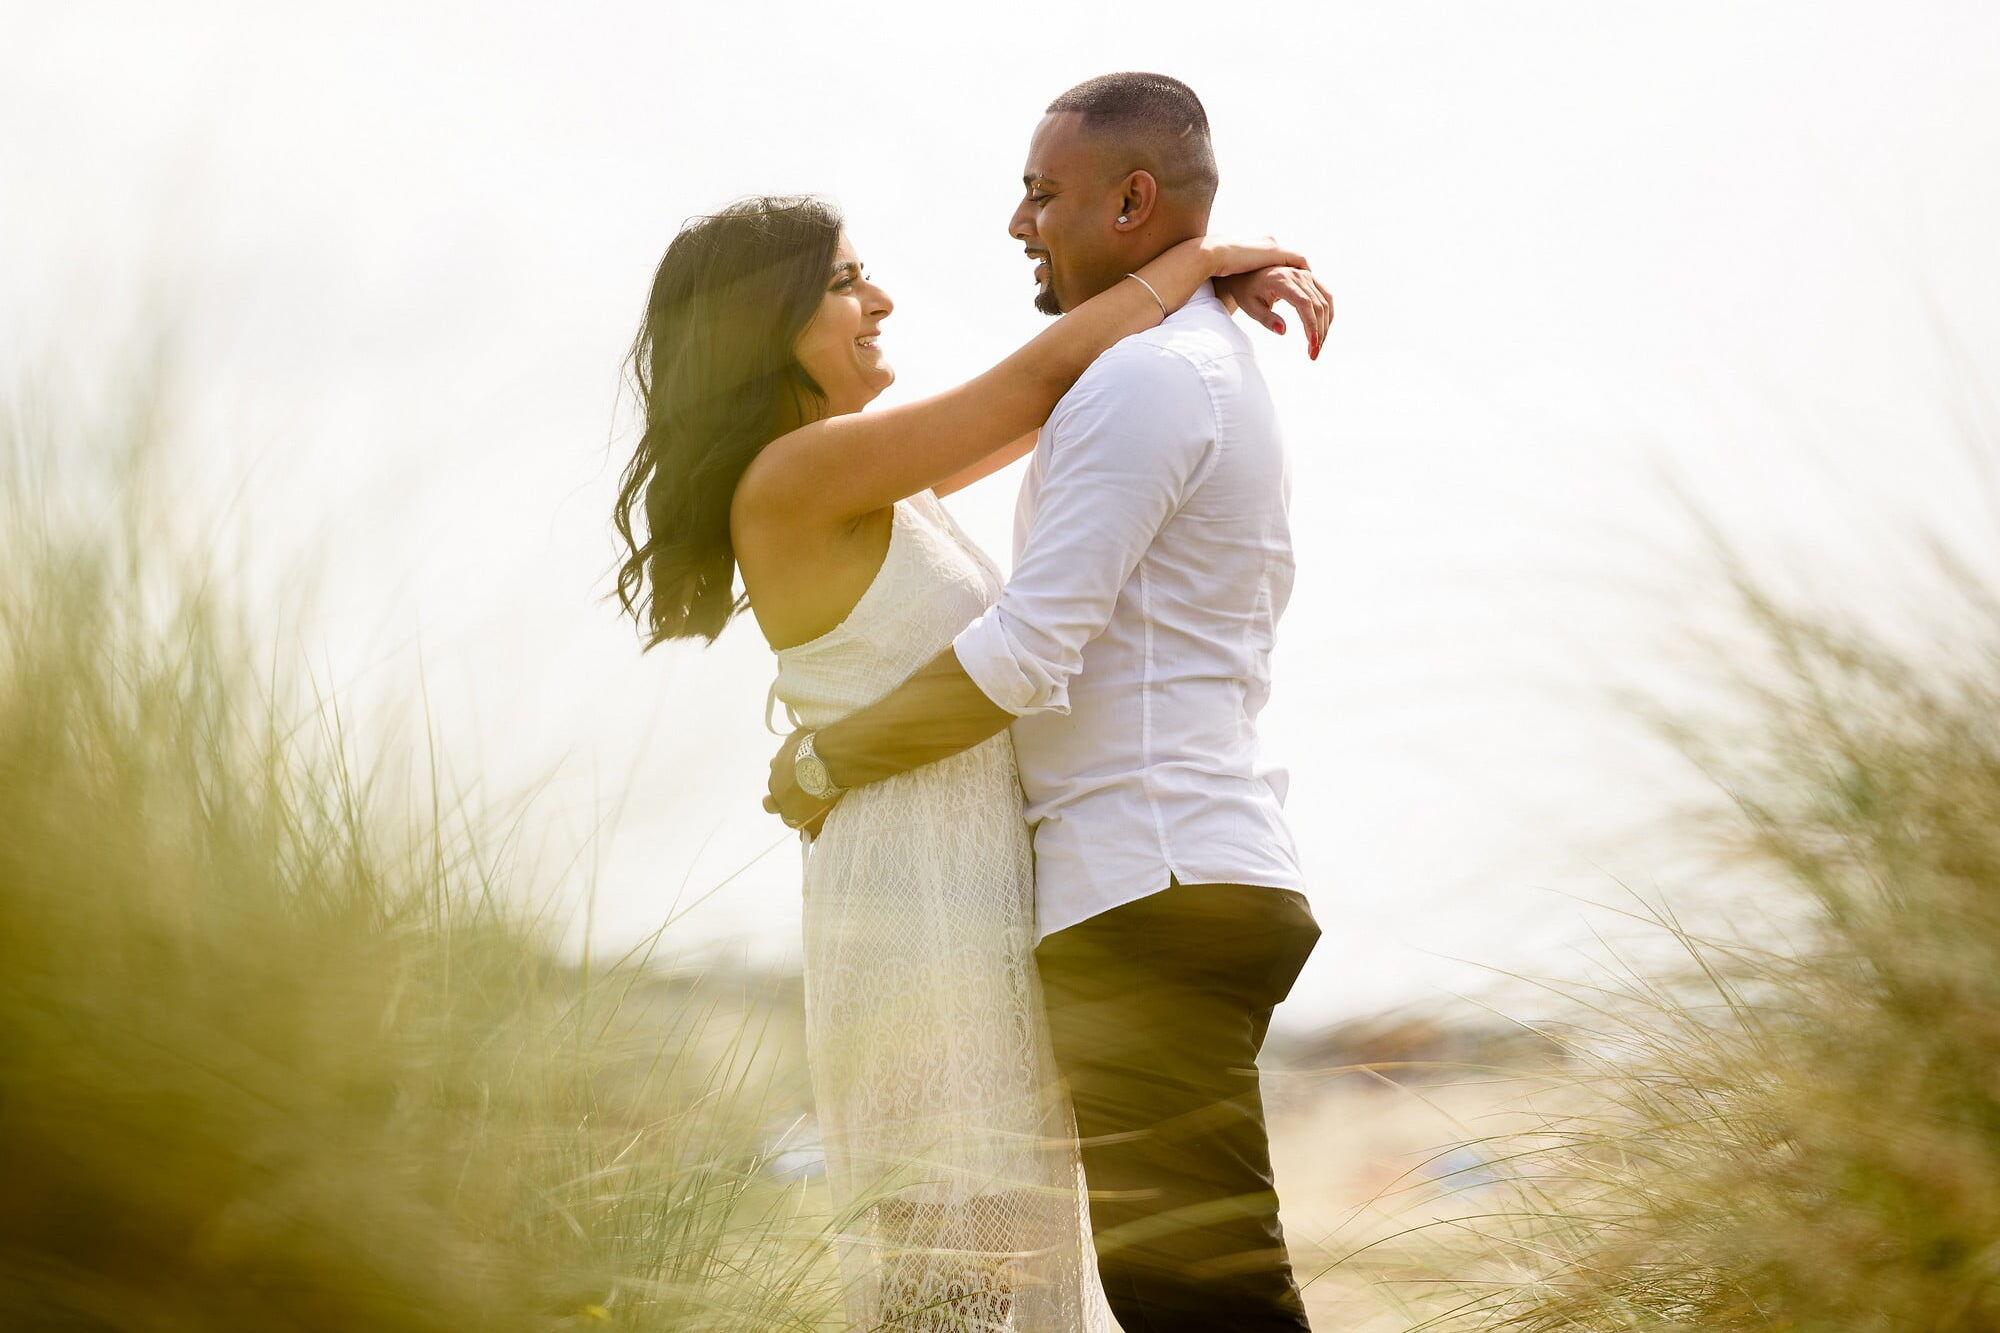 st-michaels-mount-wedding-proposal-7